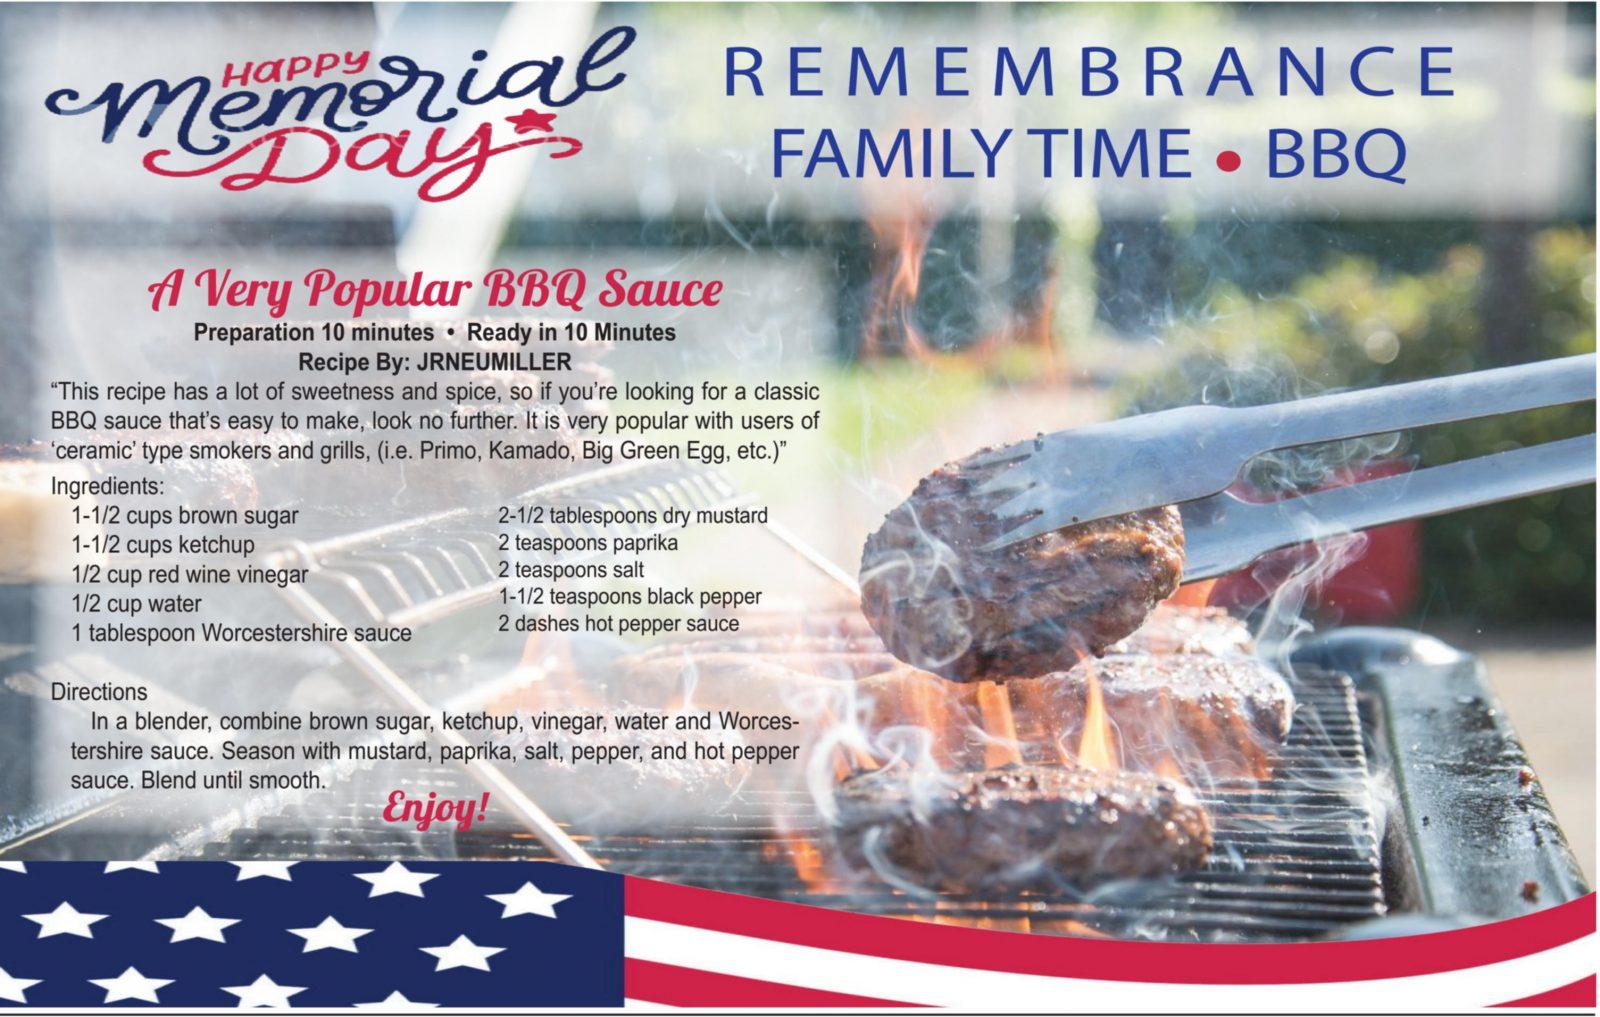 Memorial Day BBQ Sauce